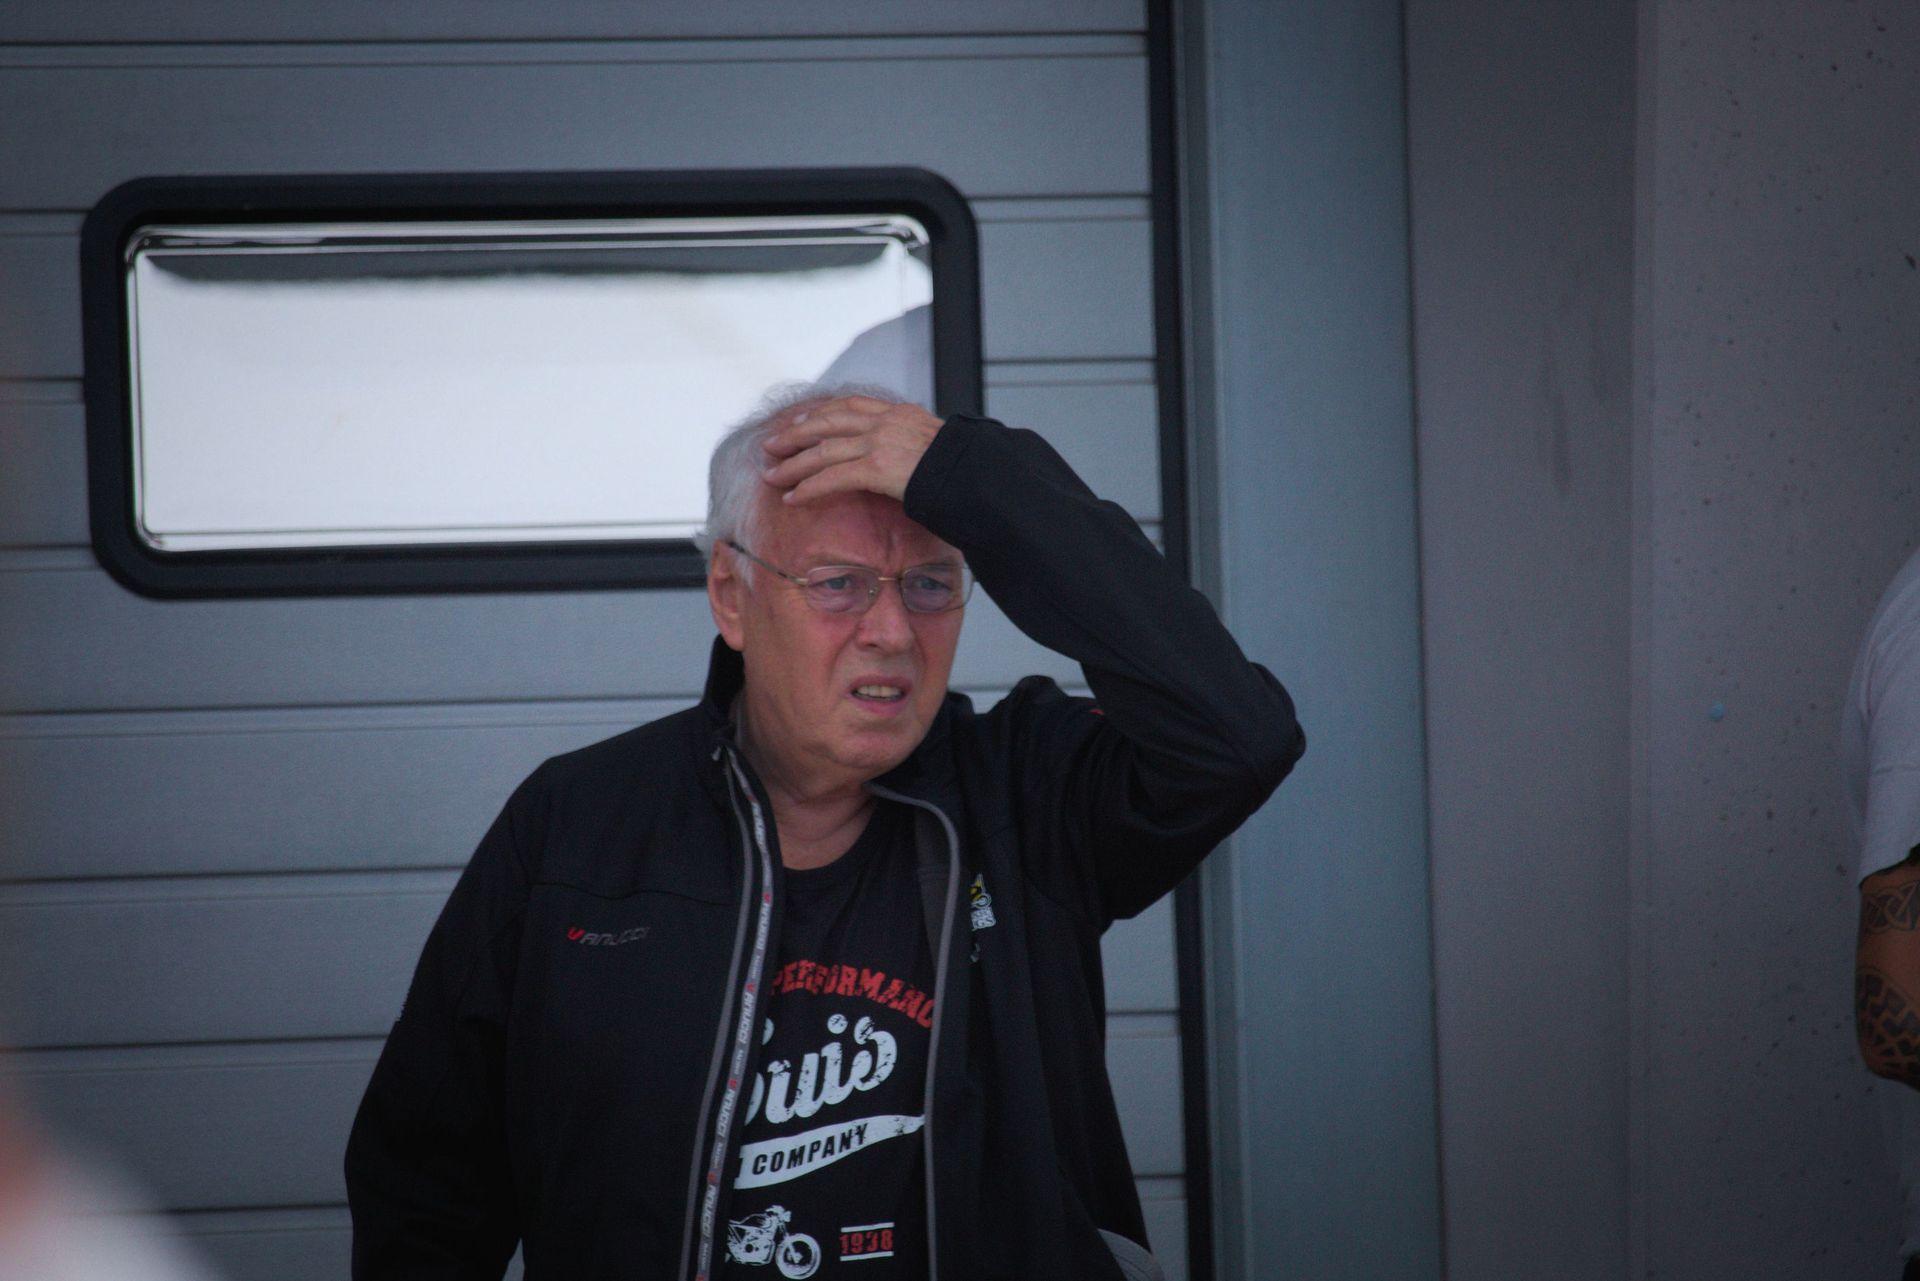 Bo Granath zur ADAC Sachsenring Classic 2017